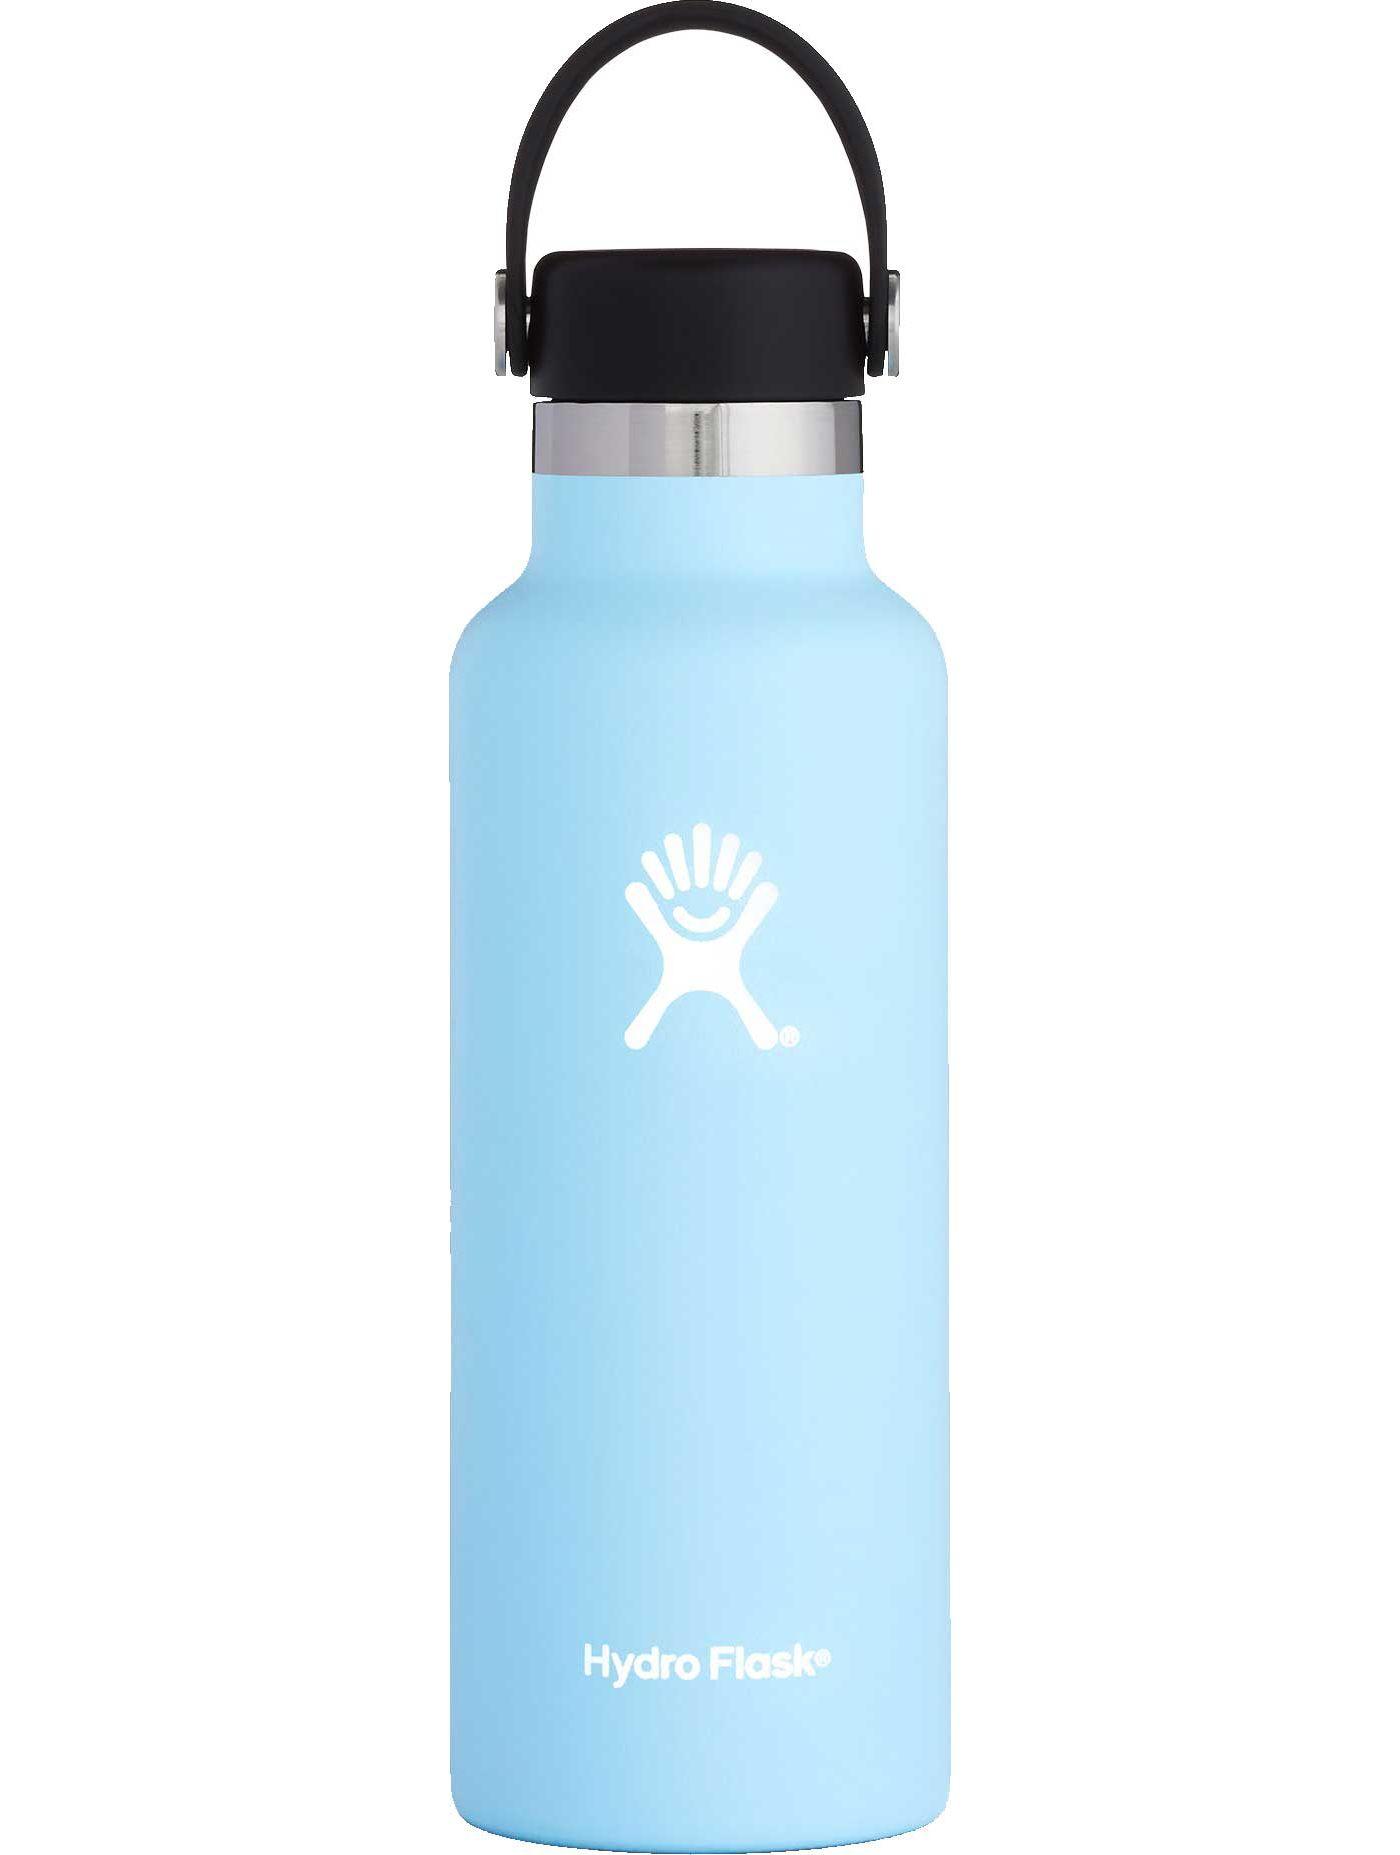 Hydro Flask Standard Mouth 18 oz. Bottle